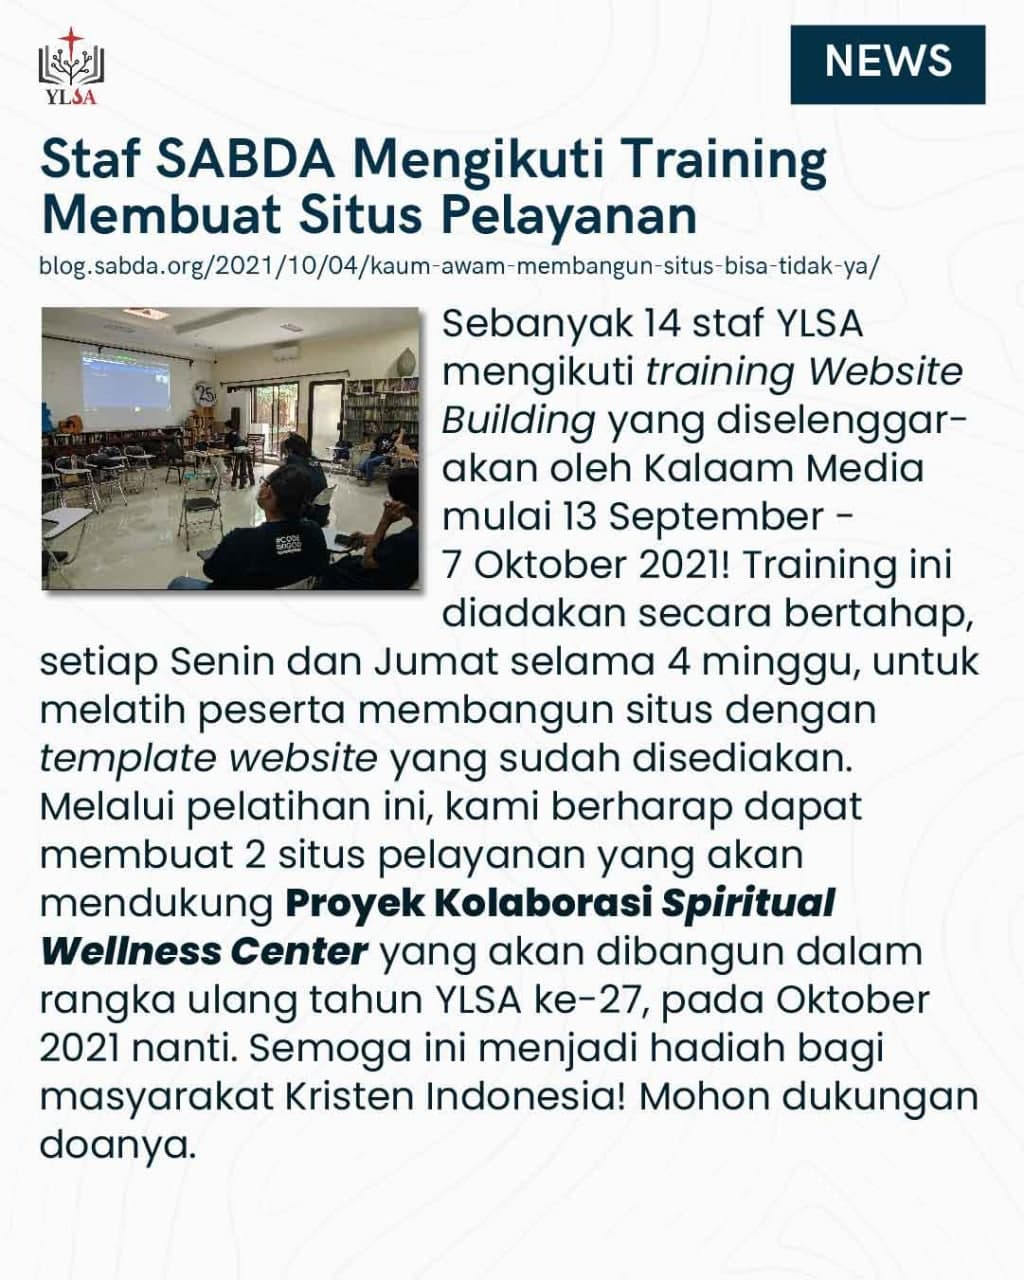 Beberapa staf YLSA mengikuti training Website Building yang diselenggarakan oleh KALAAM Media pada 13 September - 7 Oktober 2021.